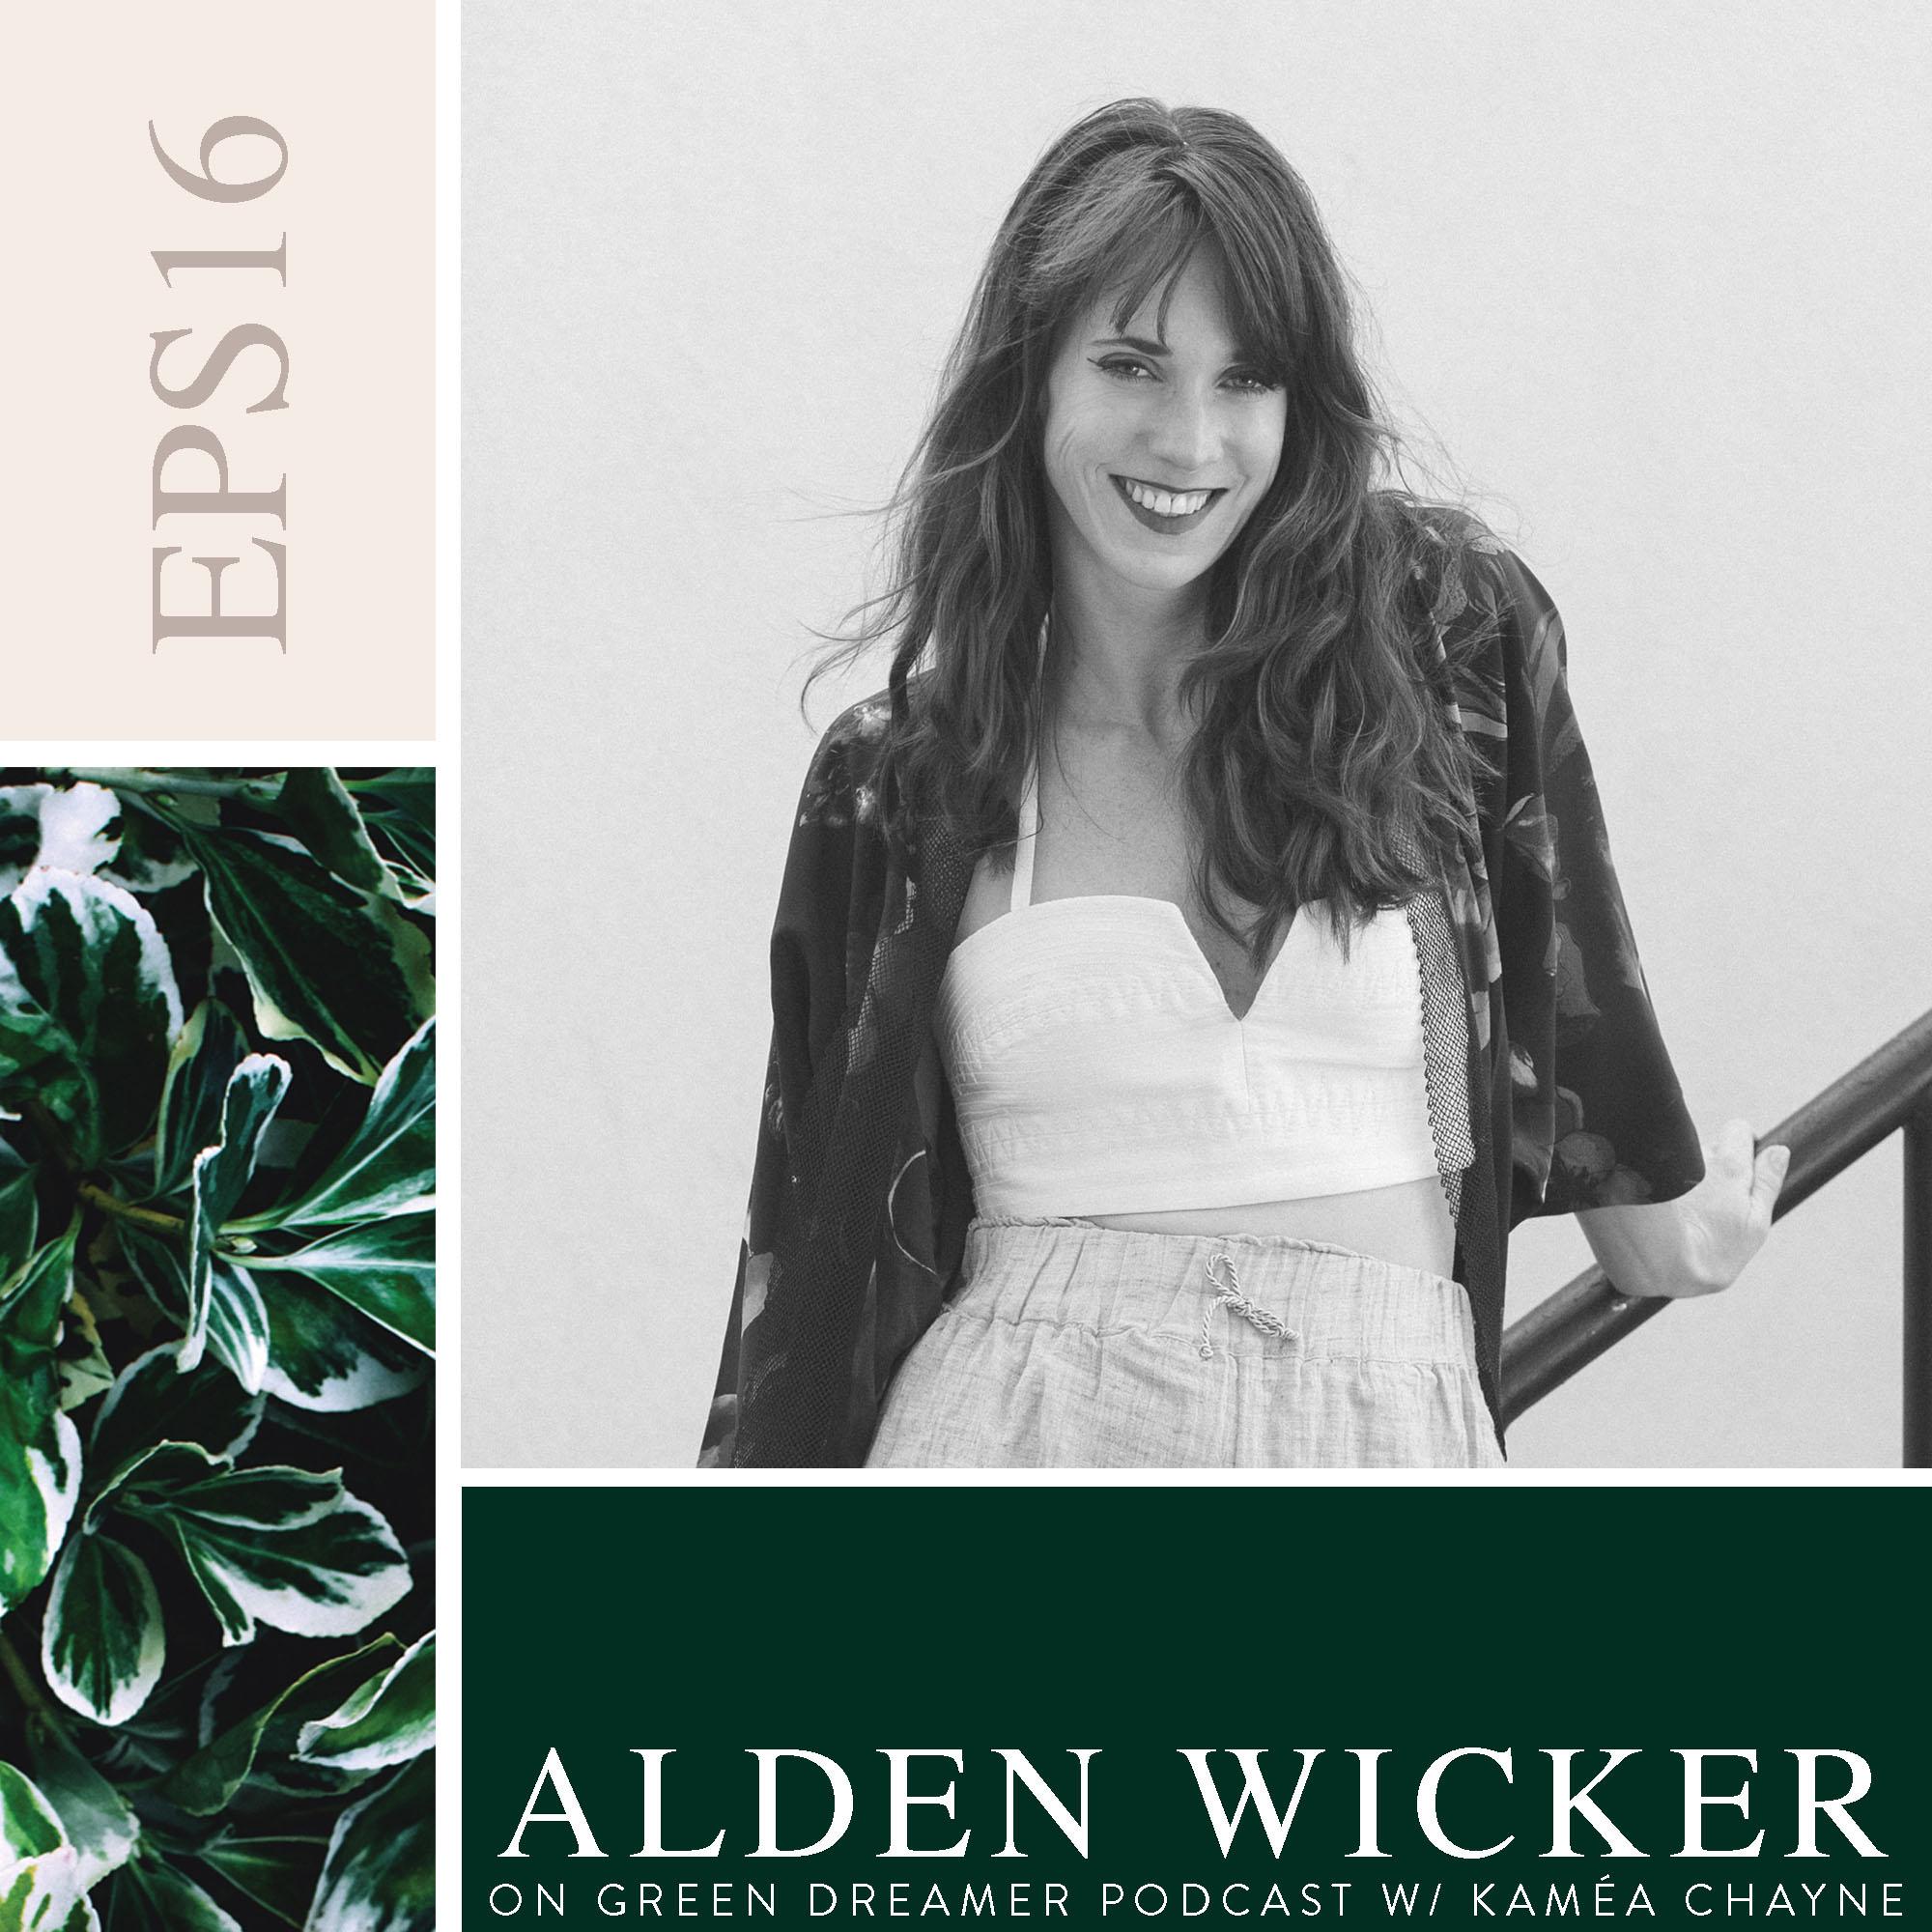 Alden Wicker on Sustainability via Green Dreamer Podcast with Kaméa Chayne